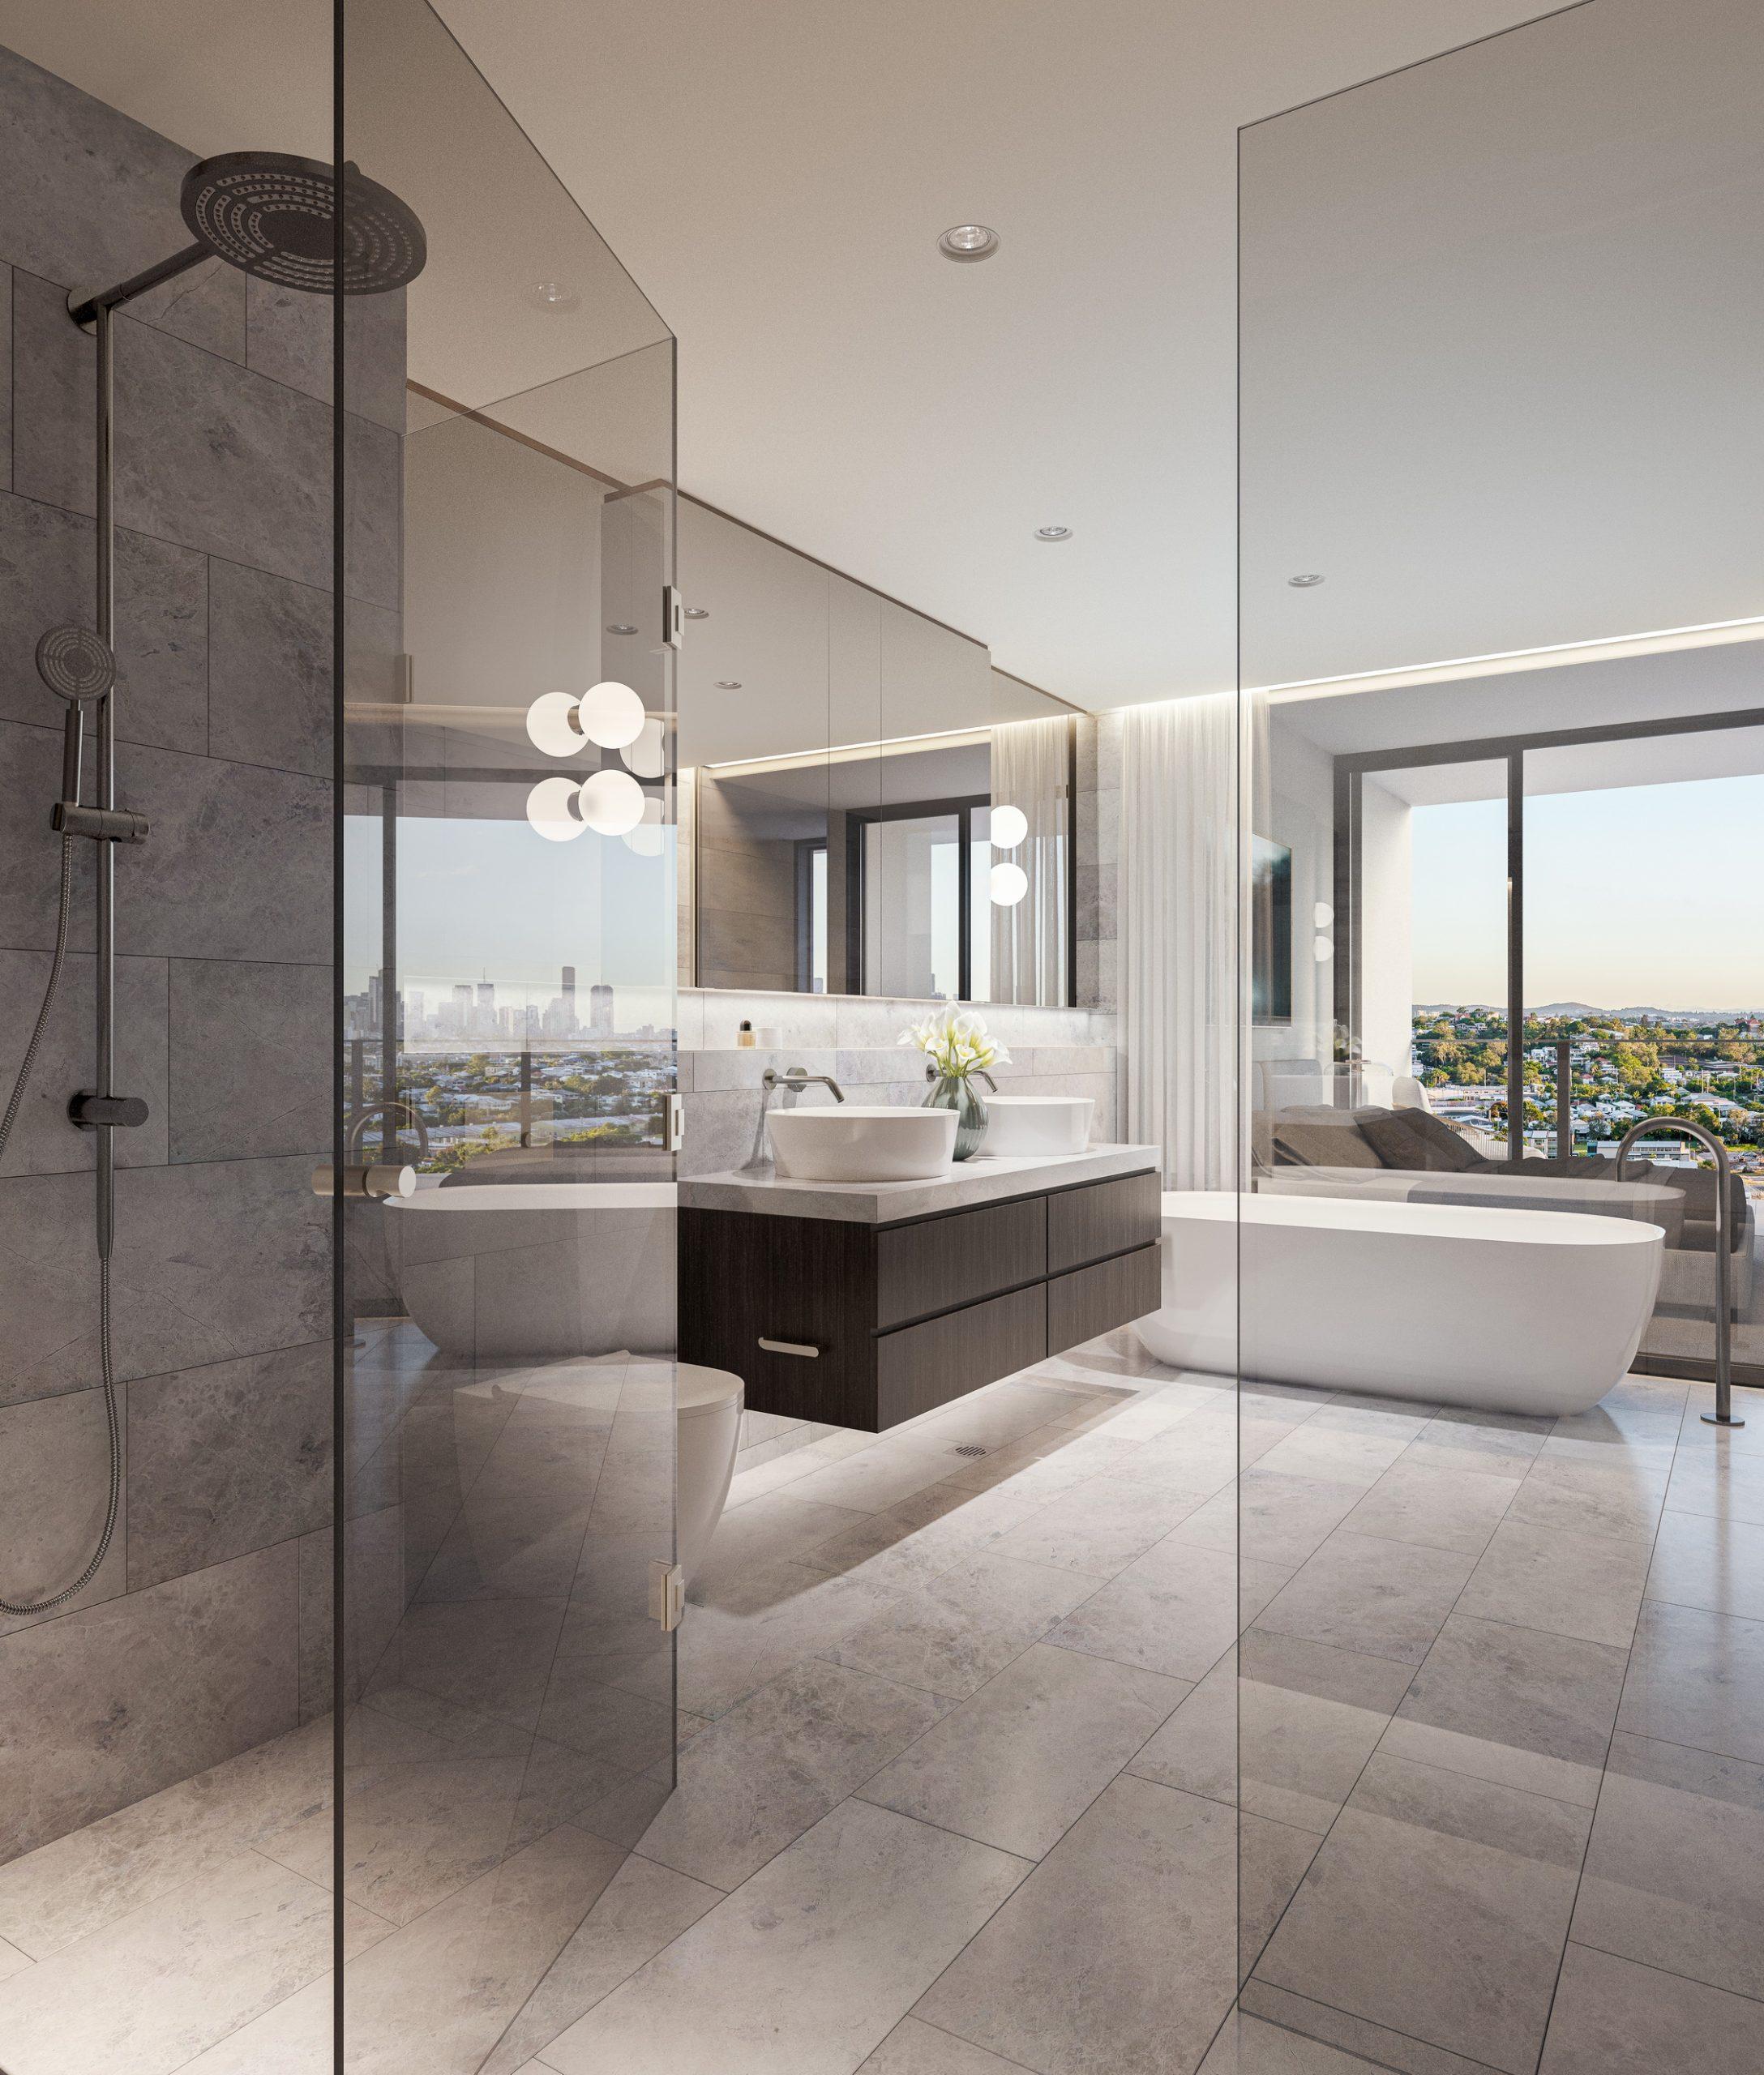 Rivello-queensland-render-3d-fkd-studio-architecture-luxury-interior-design-penthouse-bathroom